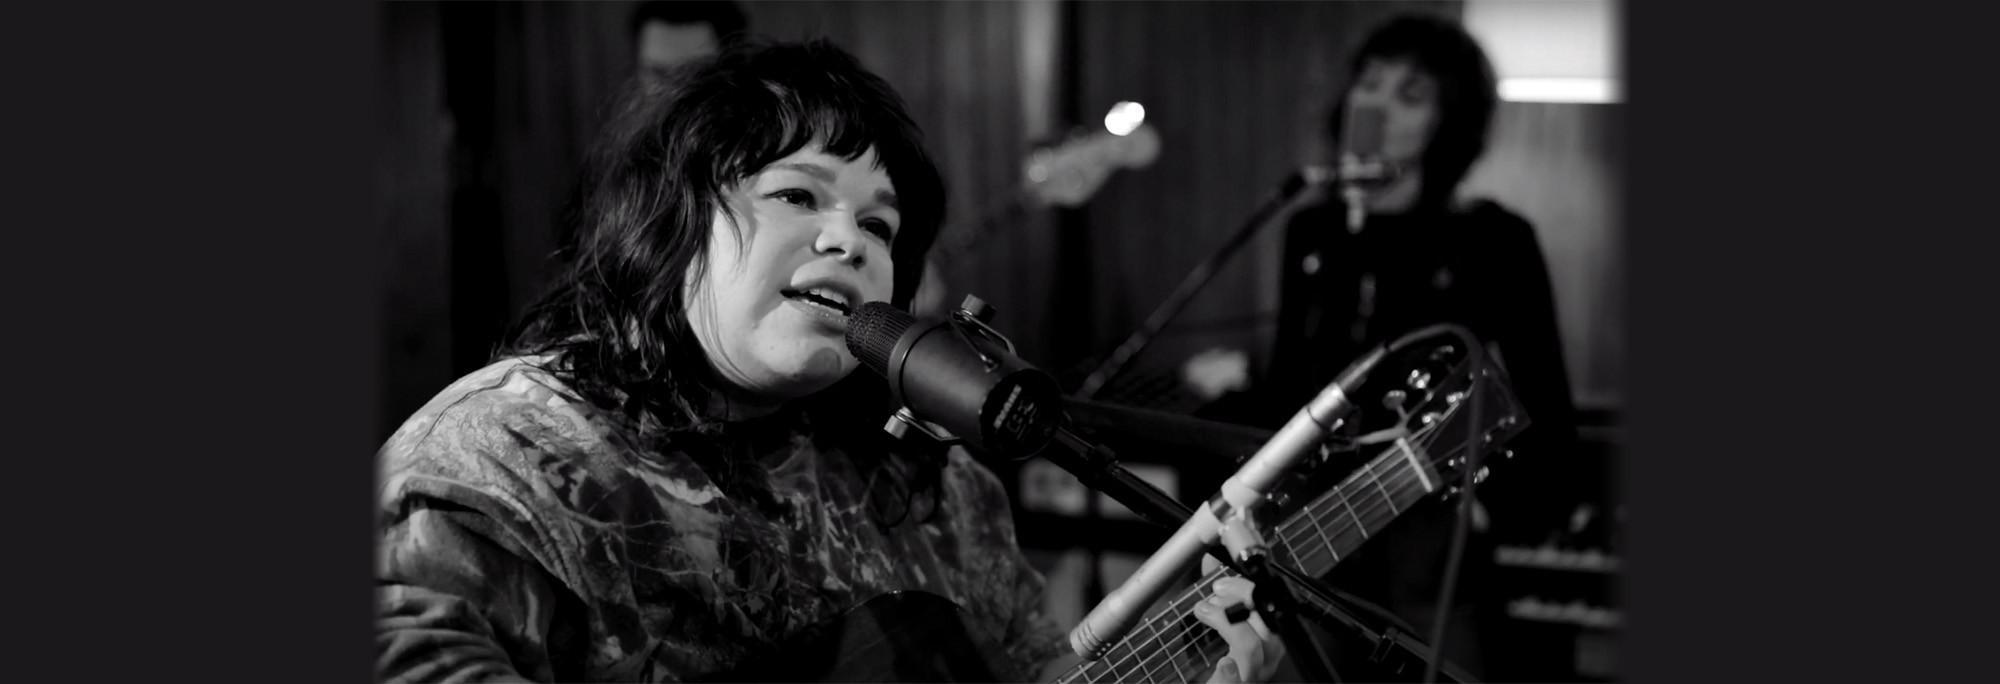 Samantha Crain - Reunion (Lunar Manor Studio Sessions)